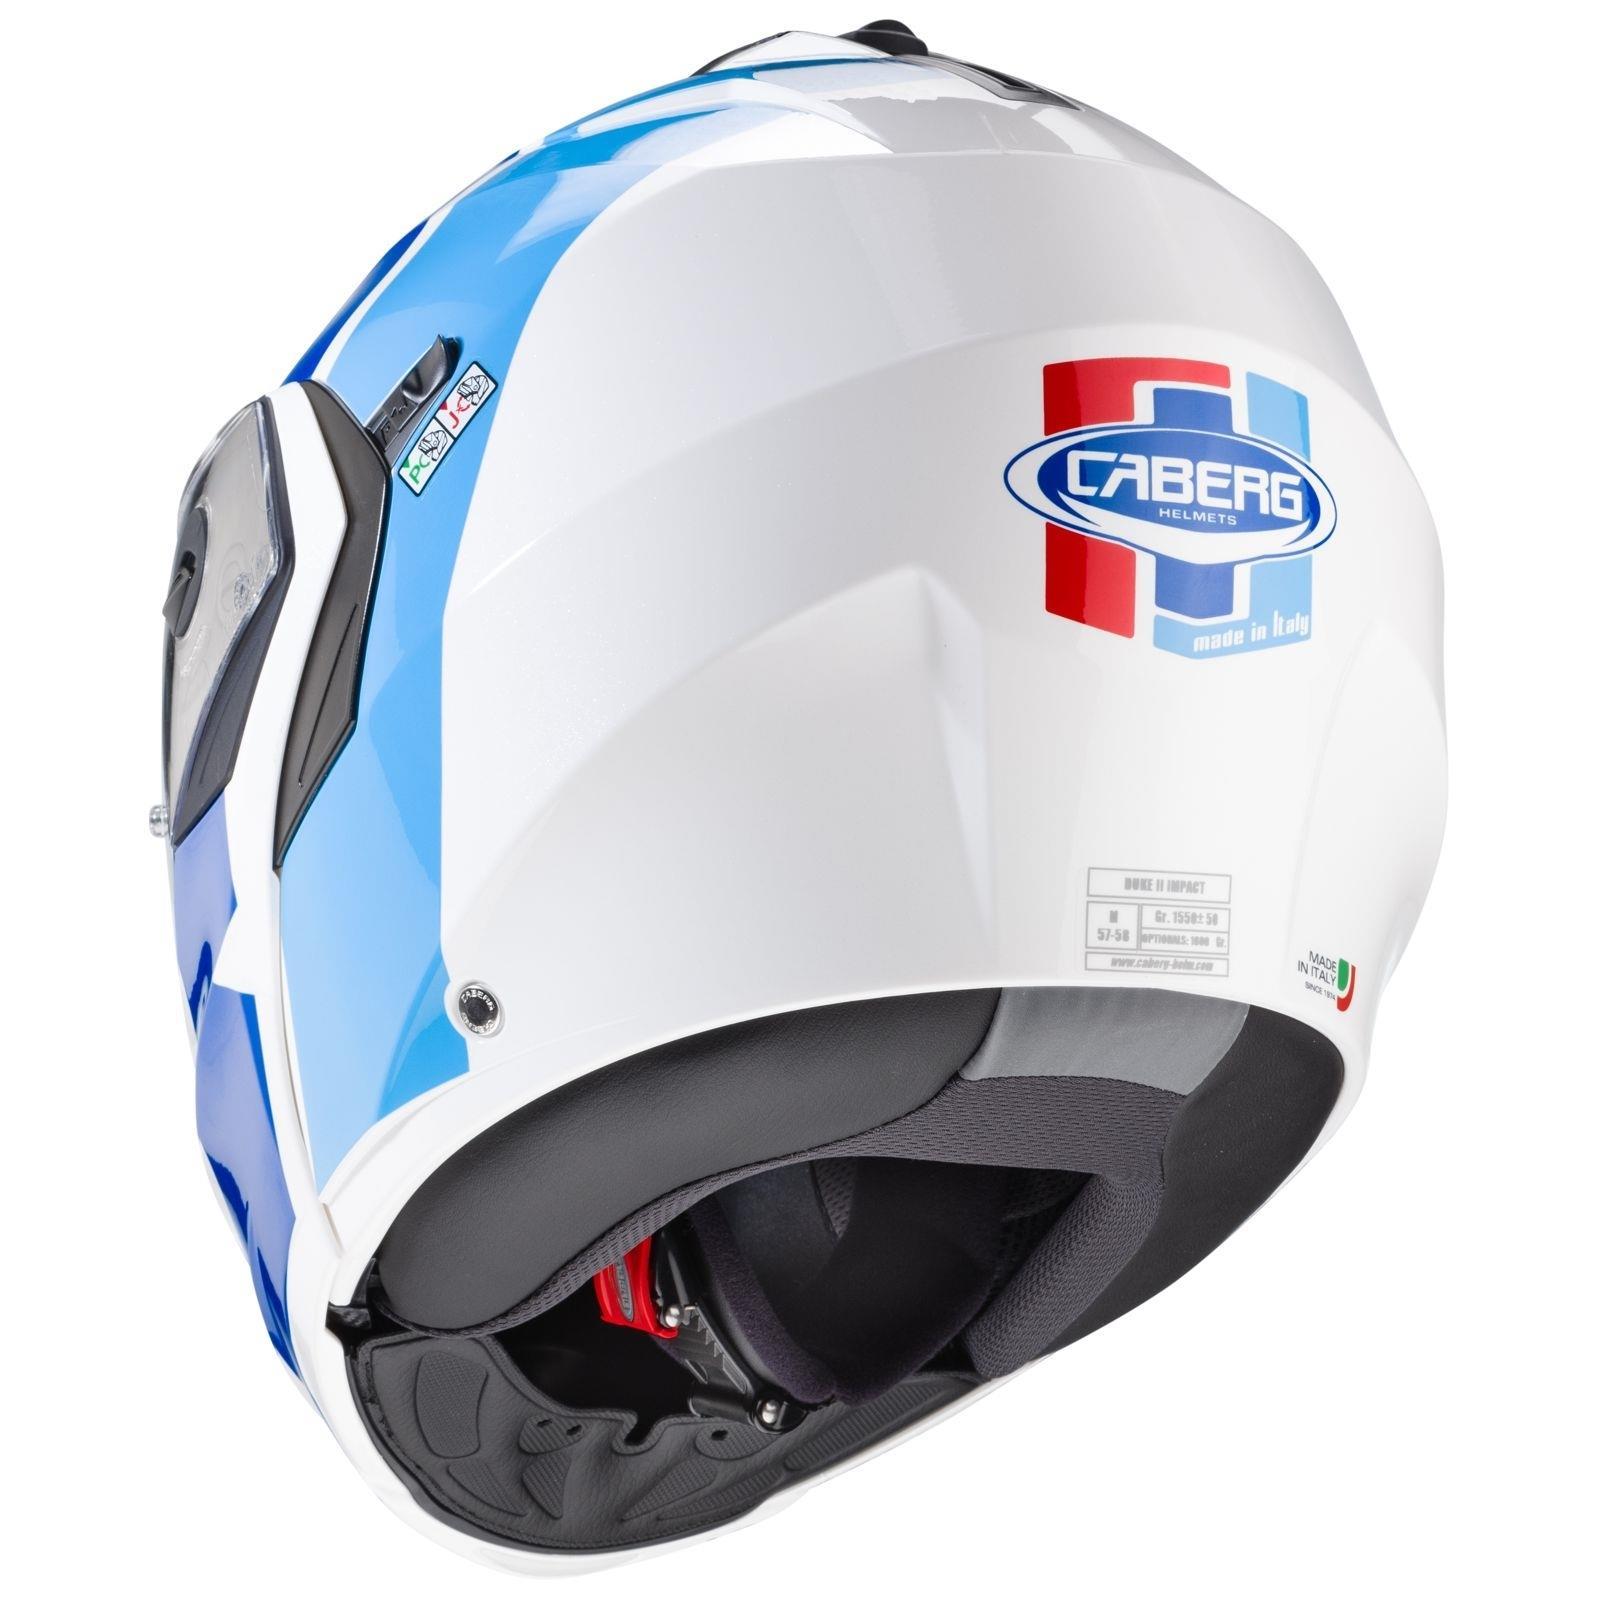 Caberg-Klapp-Helm-Duke-II-2-Motorrad-Belueftet-Sonnenblende-Pinlock-Visier-Jet Indexbild 32